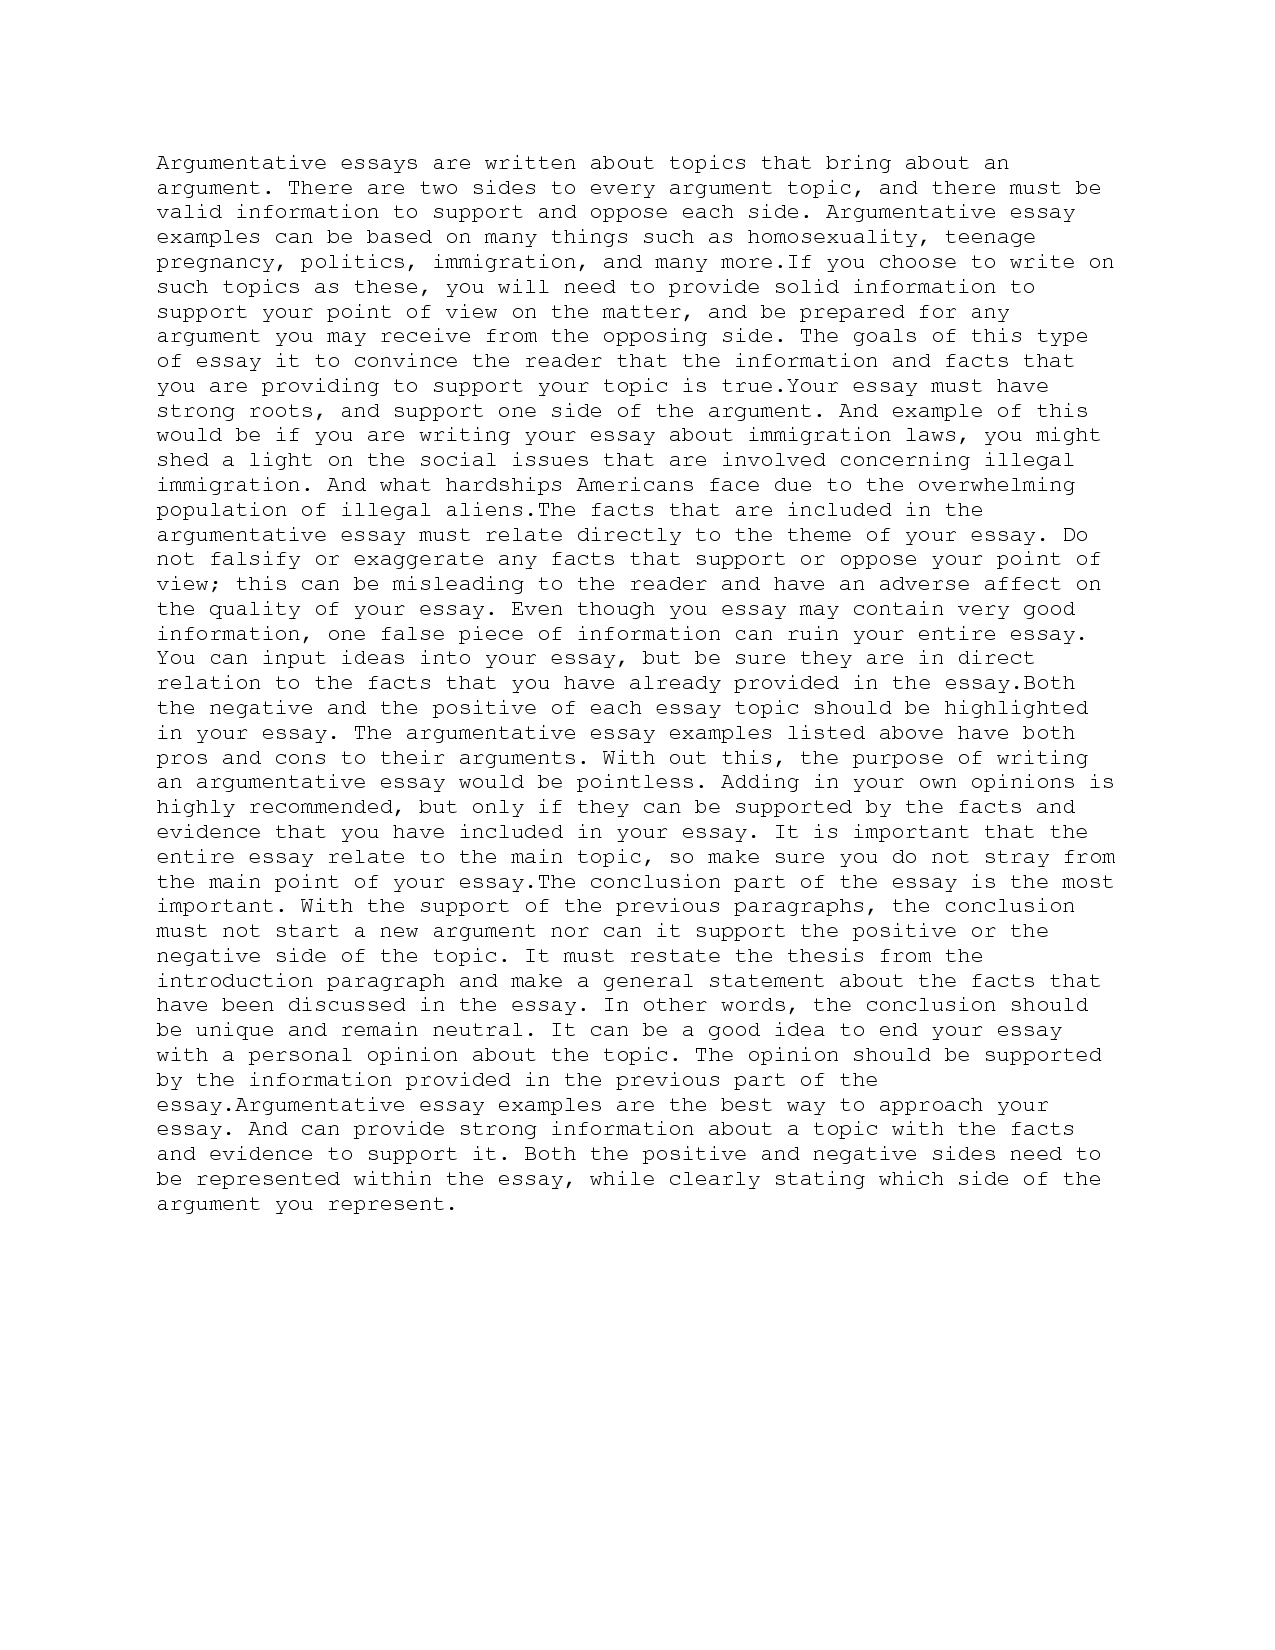 014 Qv3jjq5wkt Essay Example Good Topics For Wonderful A Discursive Interesting Higher Persuasive Full